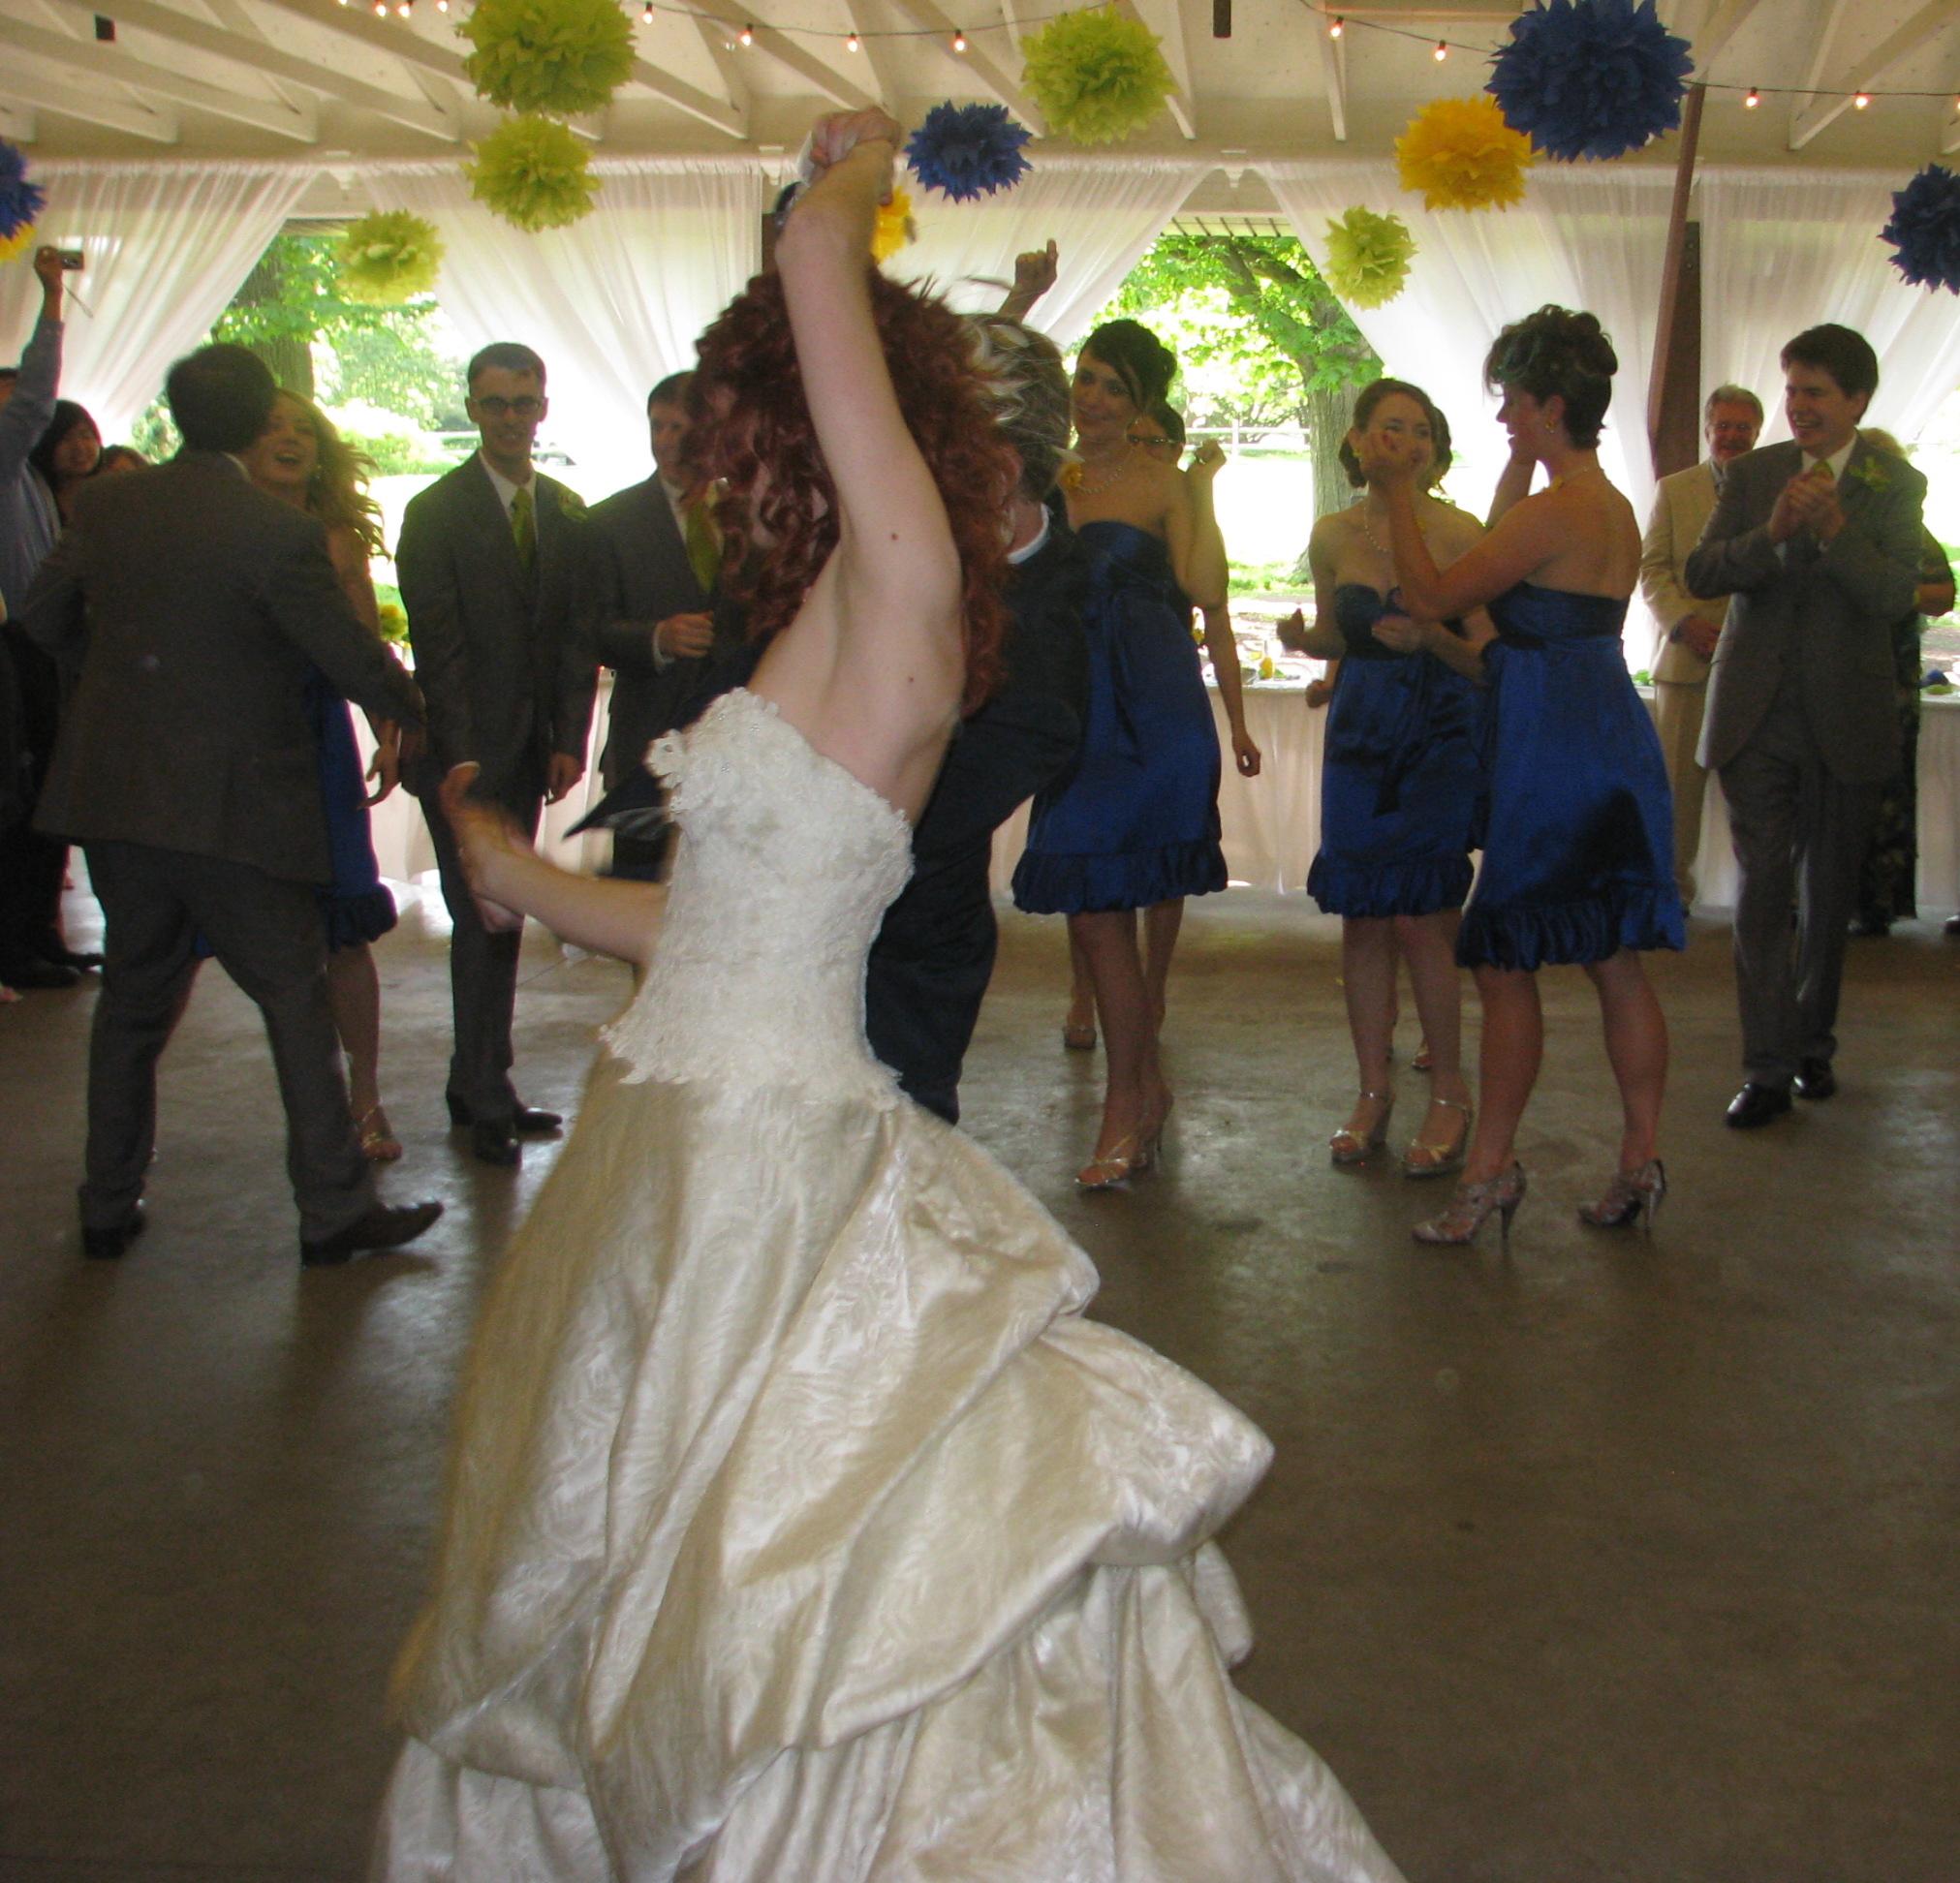 Alexandra Quinceanera Fun Rhode Island Wedding Dj Ri: Fun Rhode Island Wedding DJFun